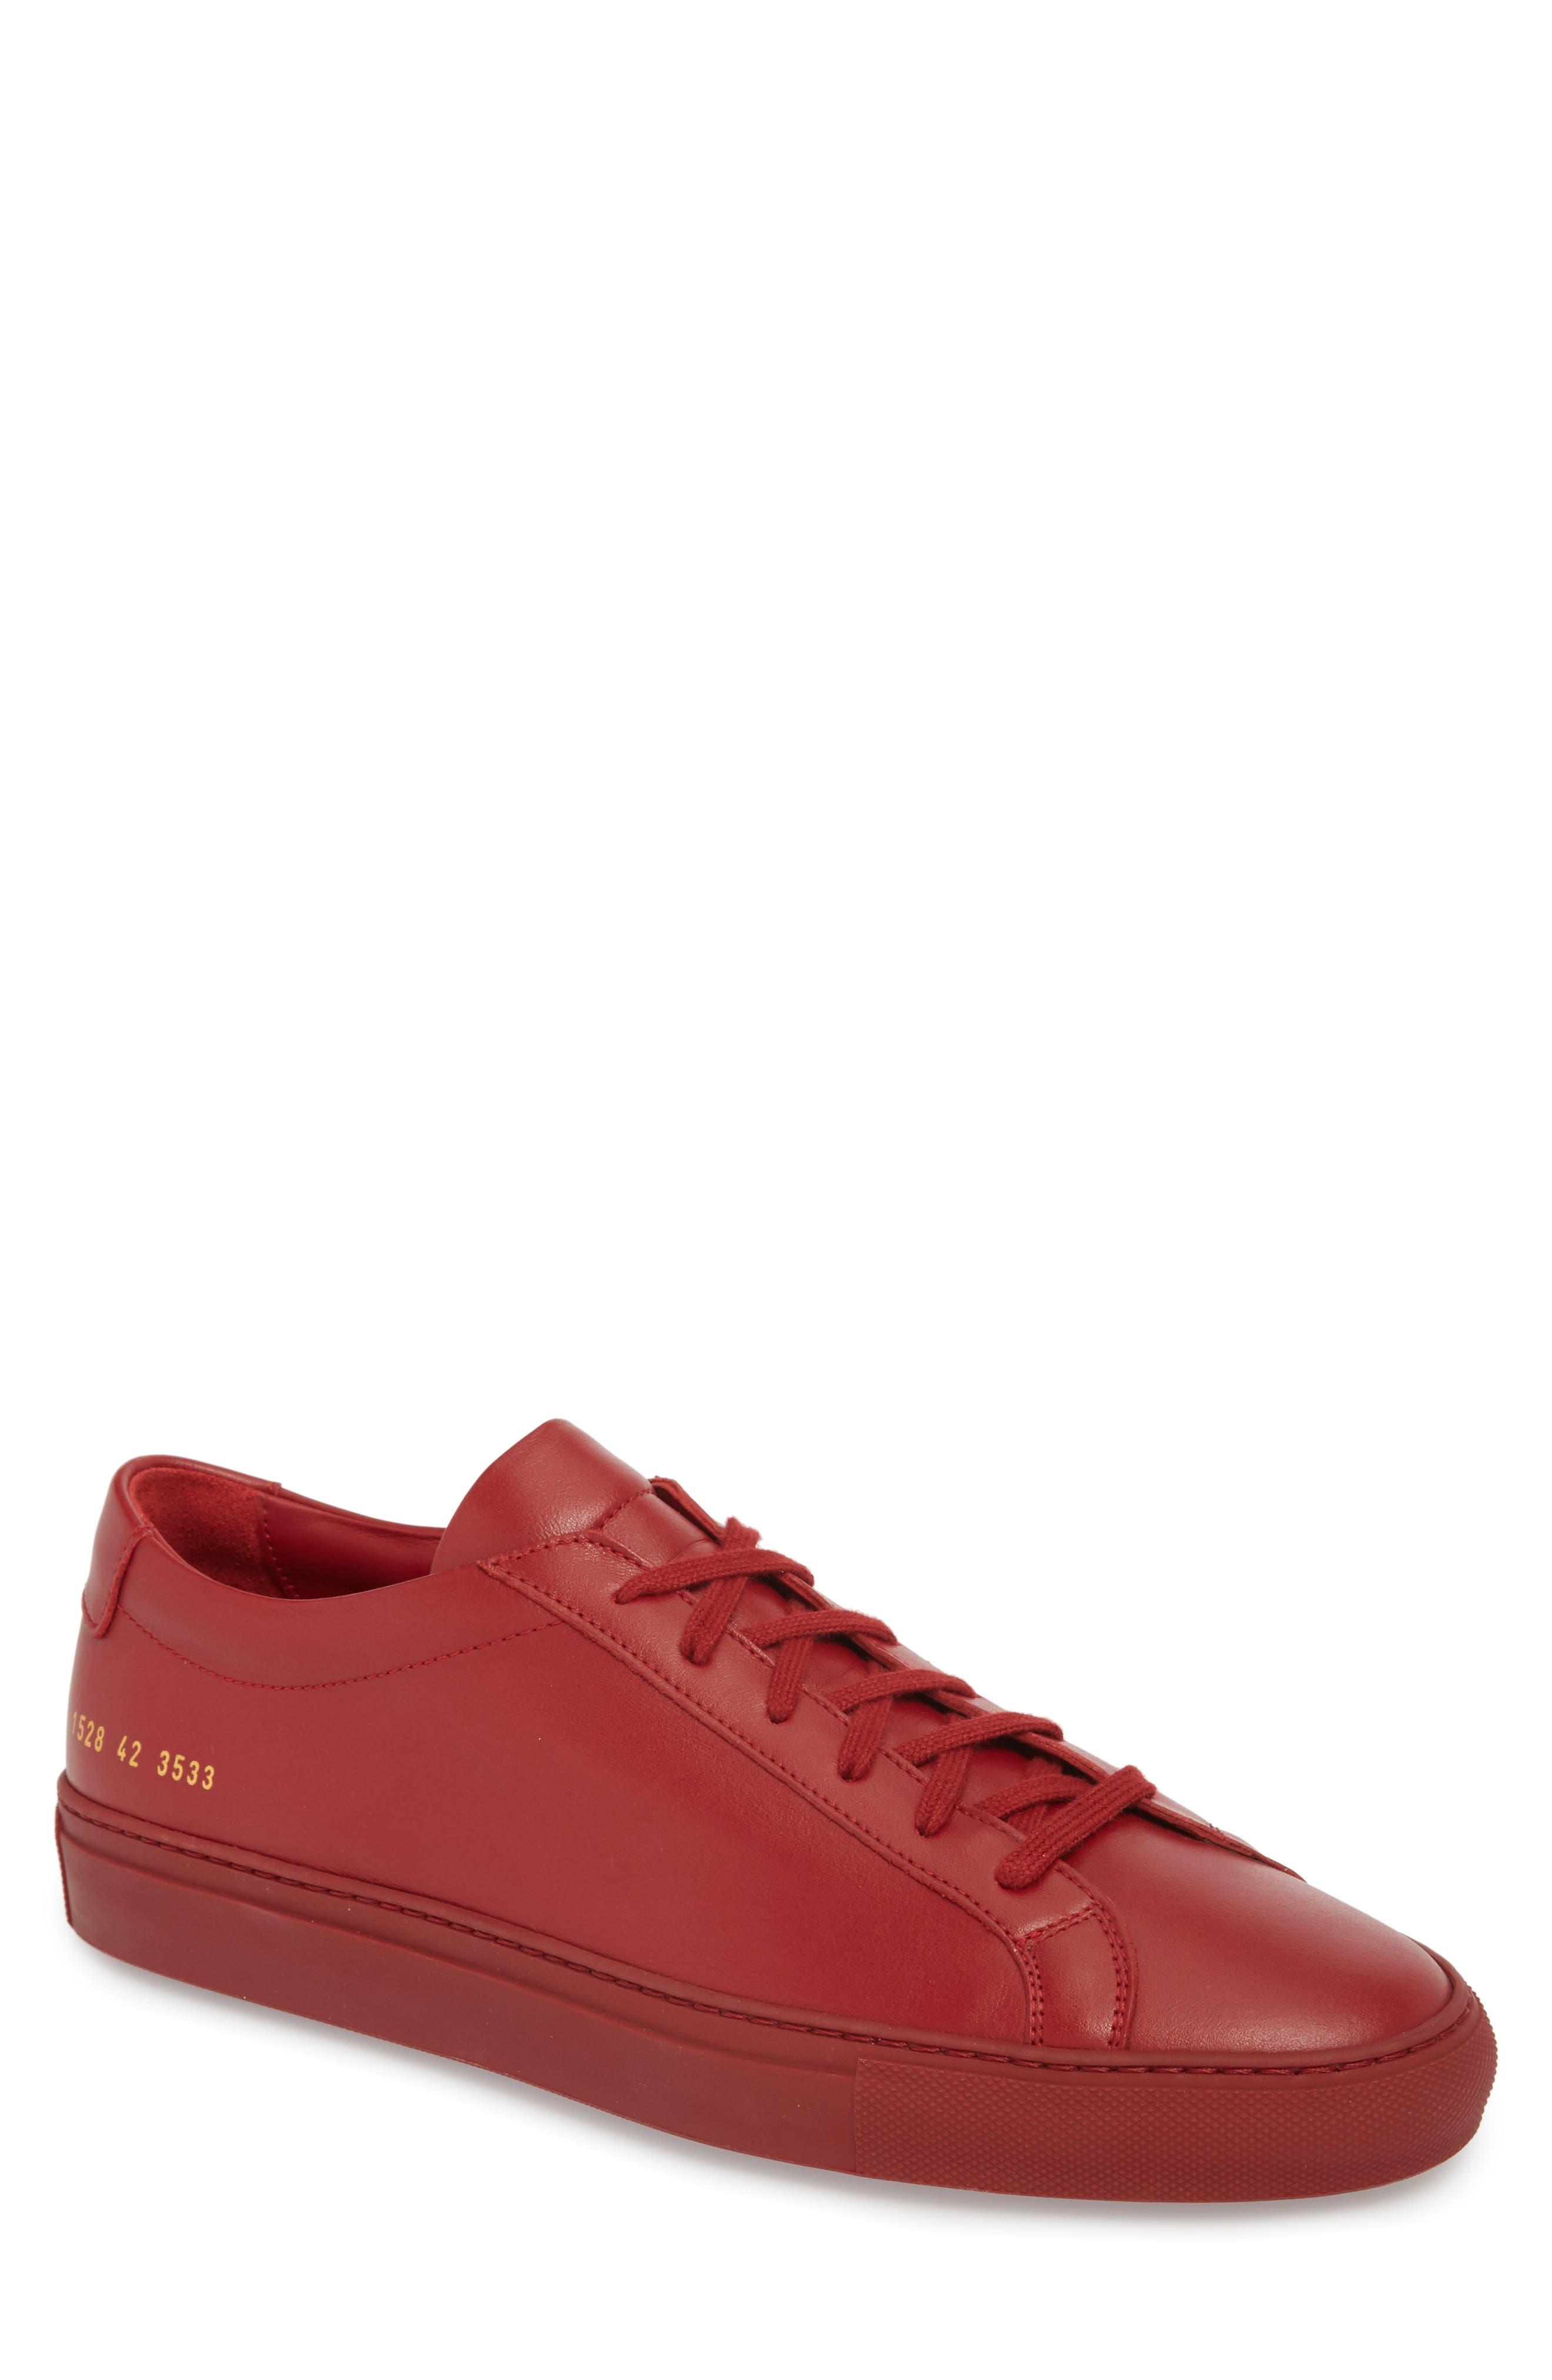 Original Achilles Sneaker,                             Main thumbnail 1, color,                             RED LEATHER